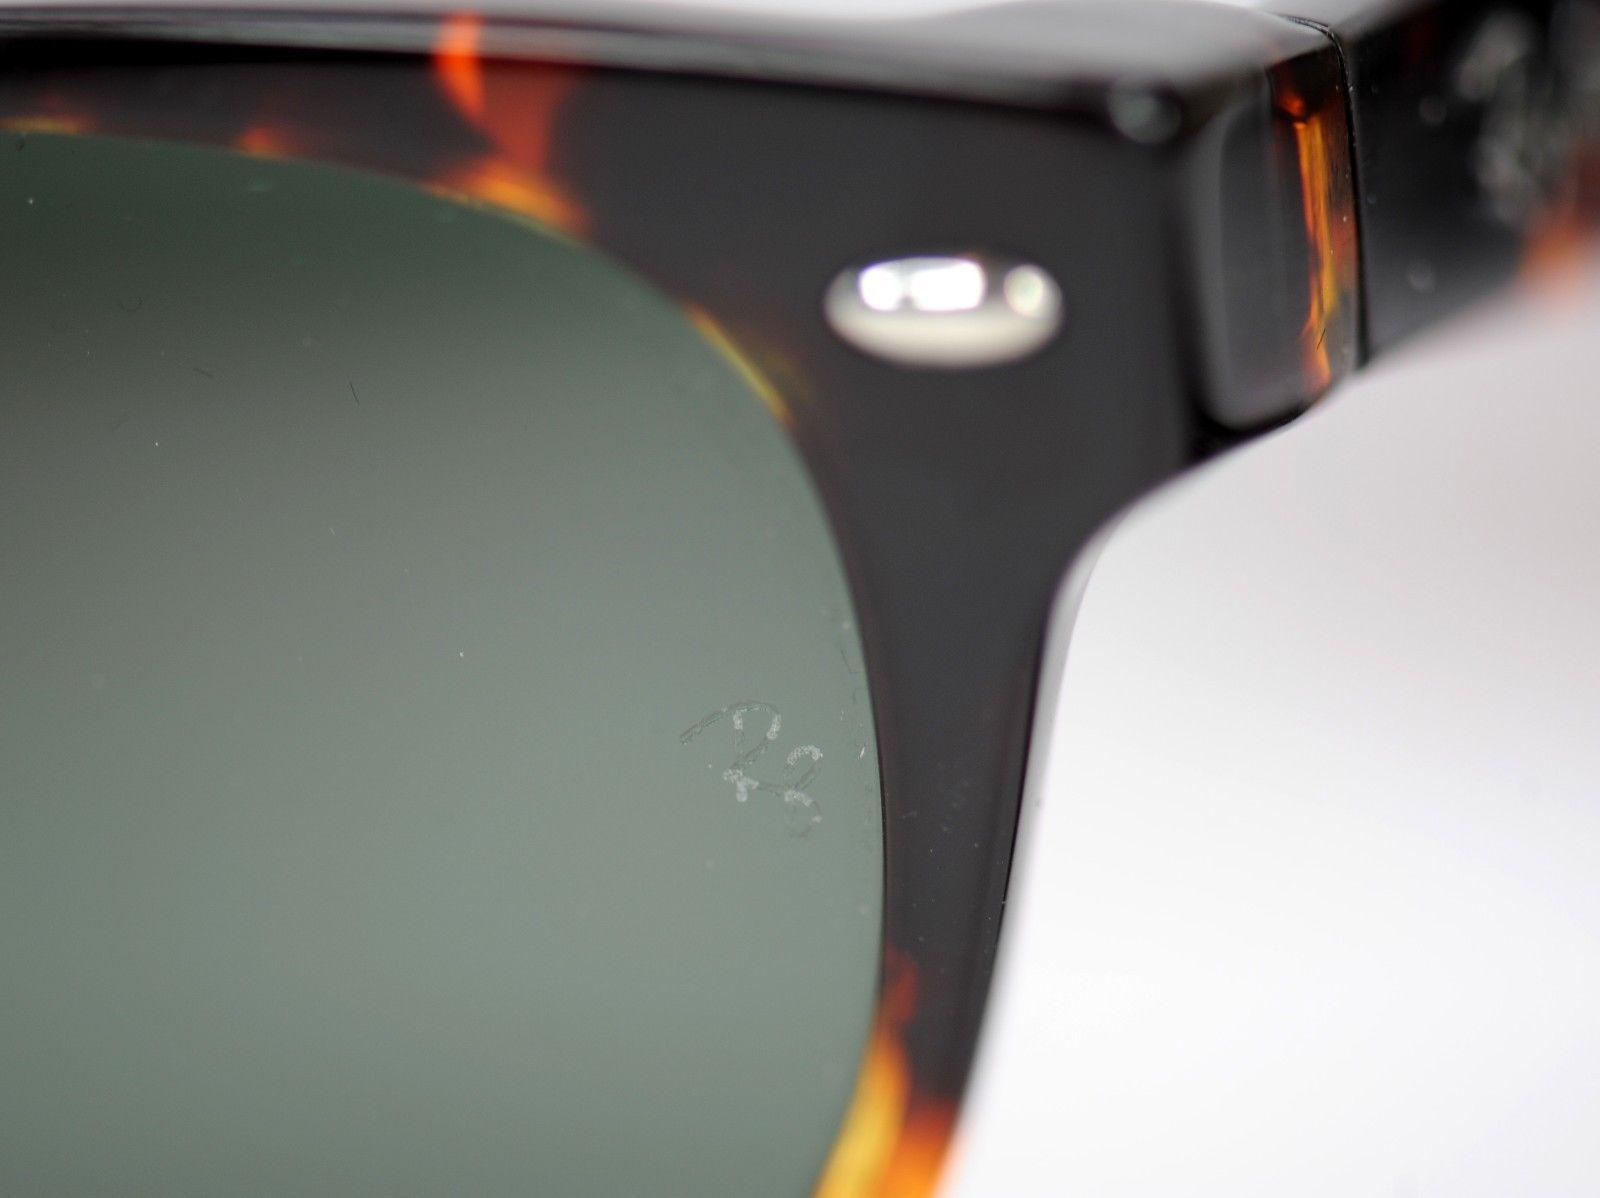 ... Ray-Ban New Wayfarer RB2132 902 52 Tortoise Frame   Green Classic G15  Sunglasses ... 992c8c1459f5